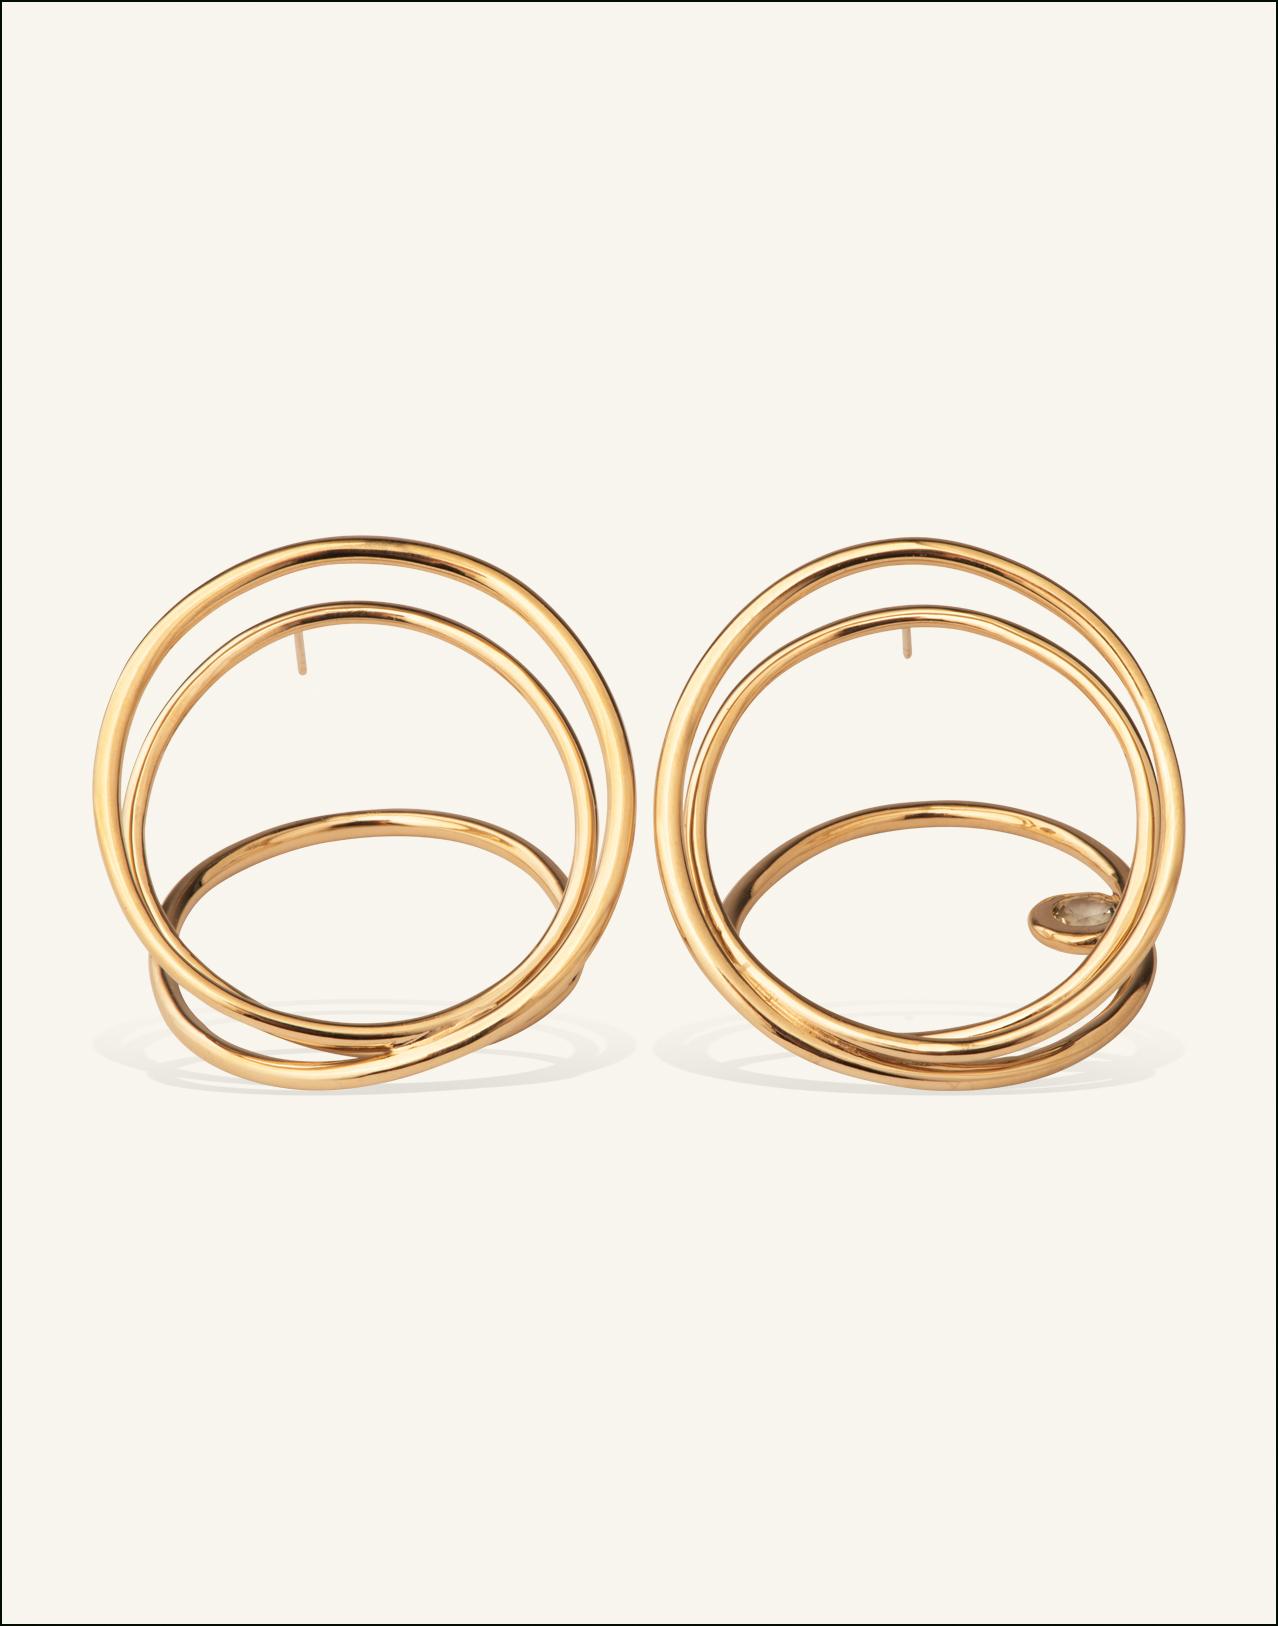 Completedworks-Earrings-Gold-Vermeil-The-Idea-of-Order-3-1.jpg